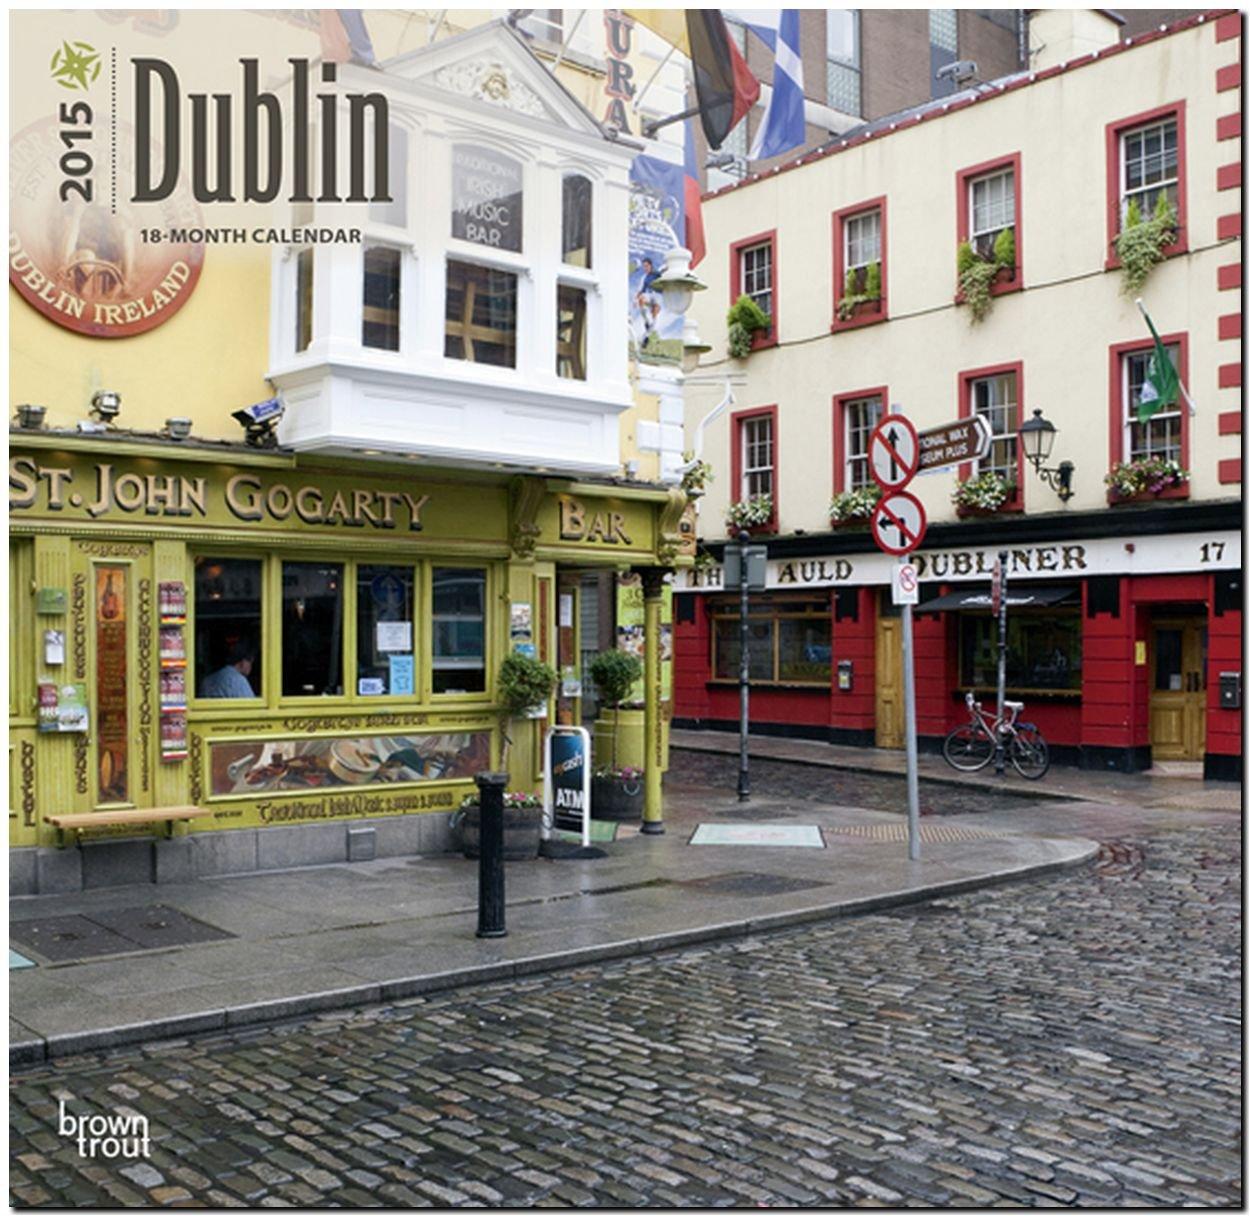 Dublin 2015: Original BrownTrout-Kalender [Mehrsprachig] [Kalender]